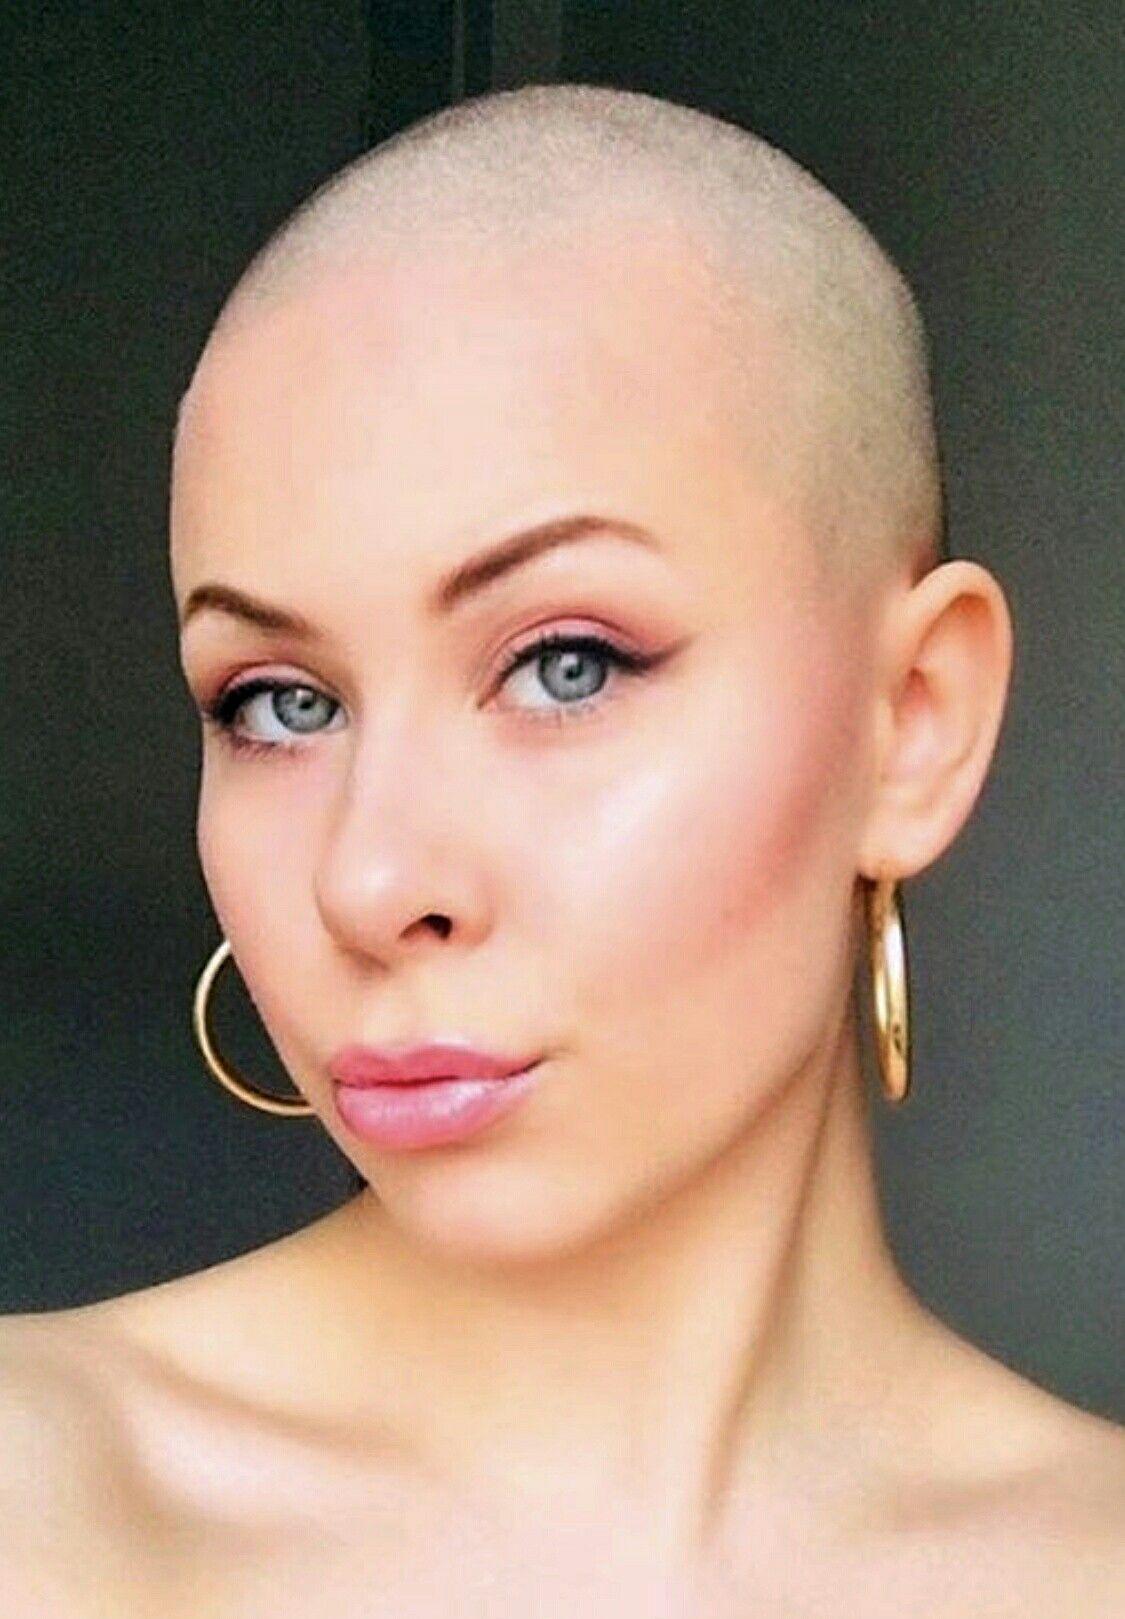 bald head 3.jpg